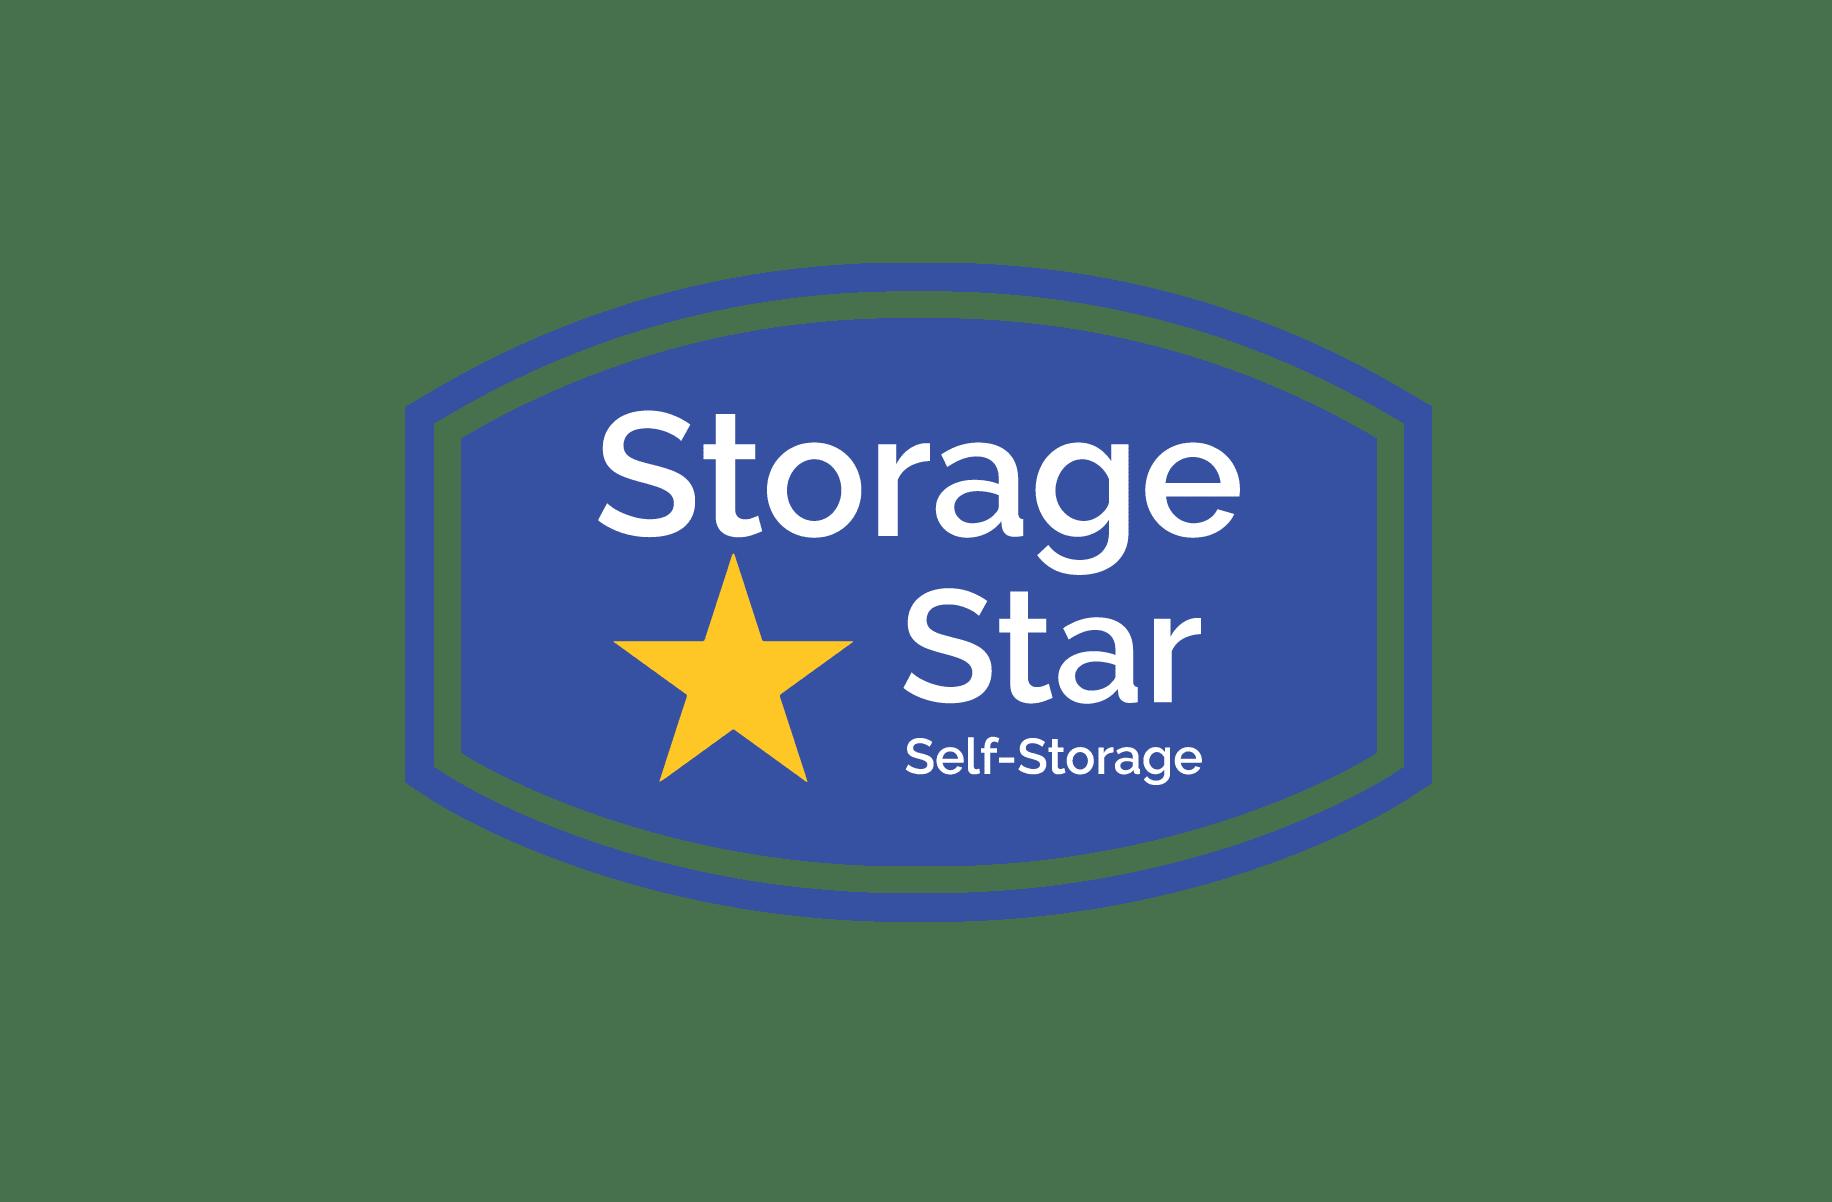 Storage Star